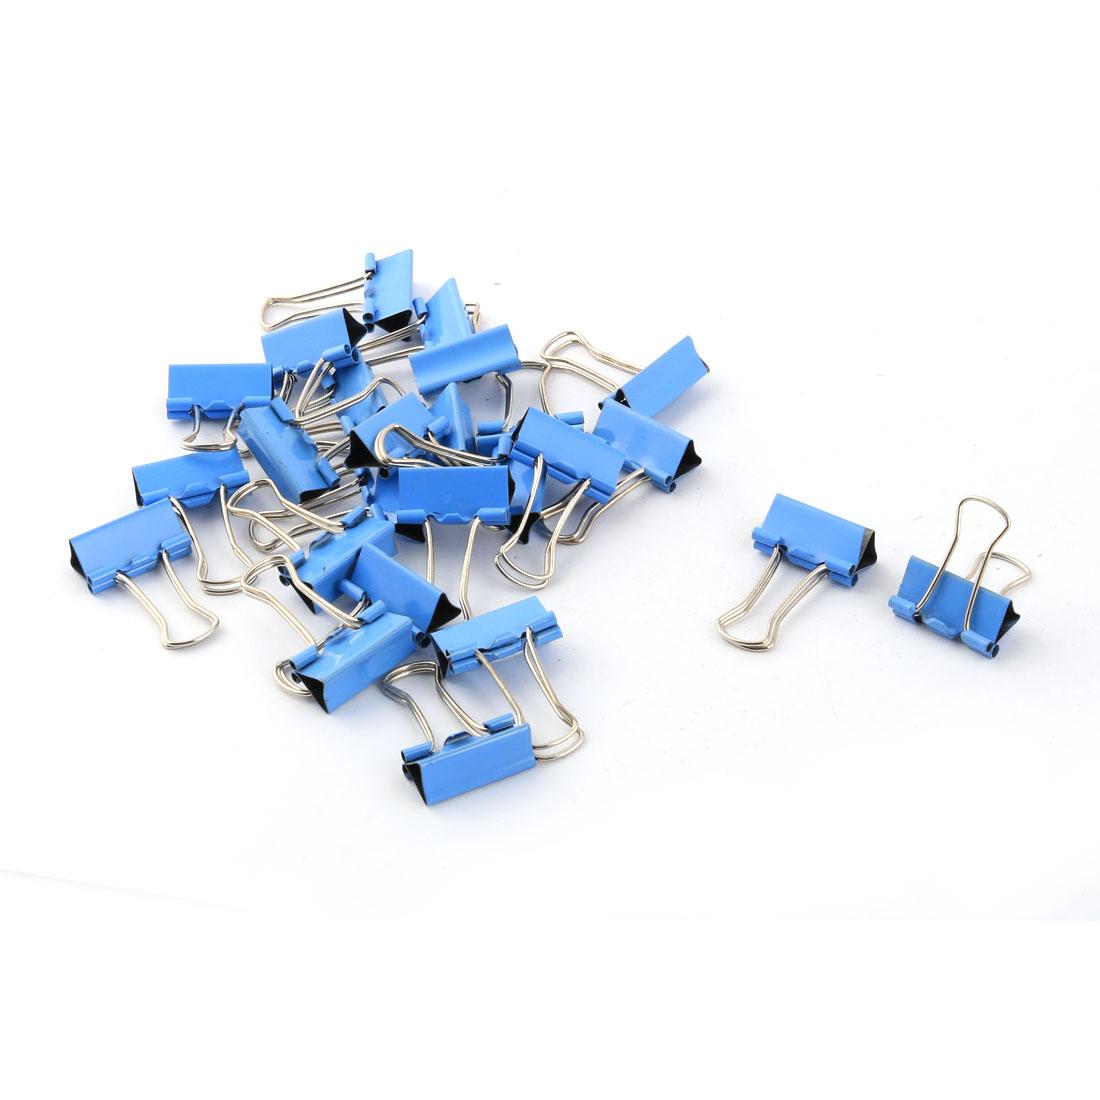 Office Supplies Folder Paper Money Bulldog Clip Blue Silver Tone 25pcs